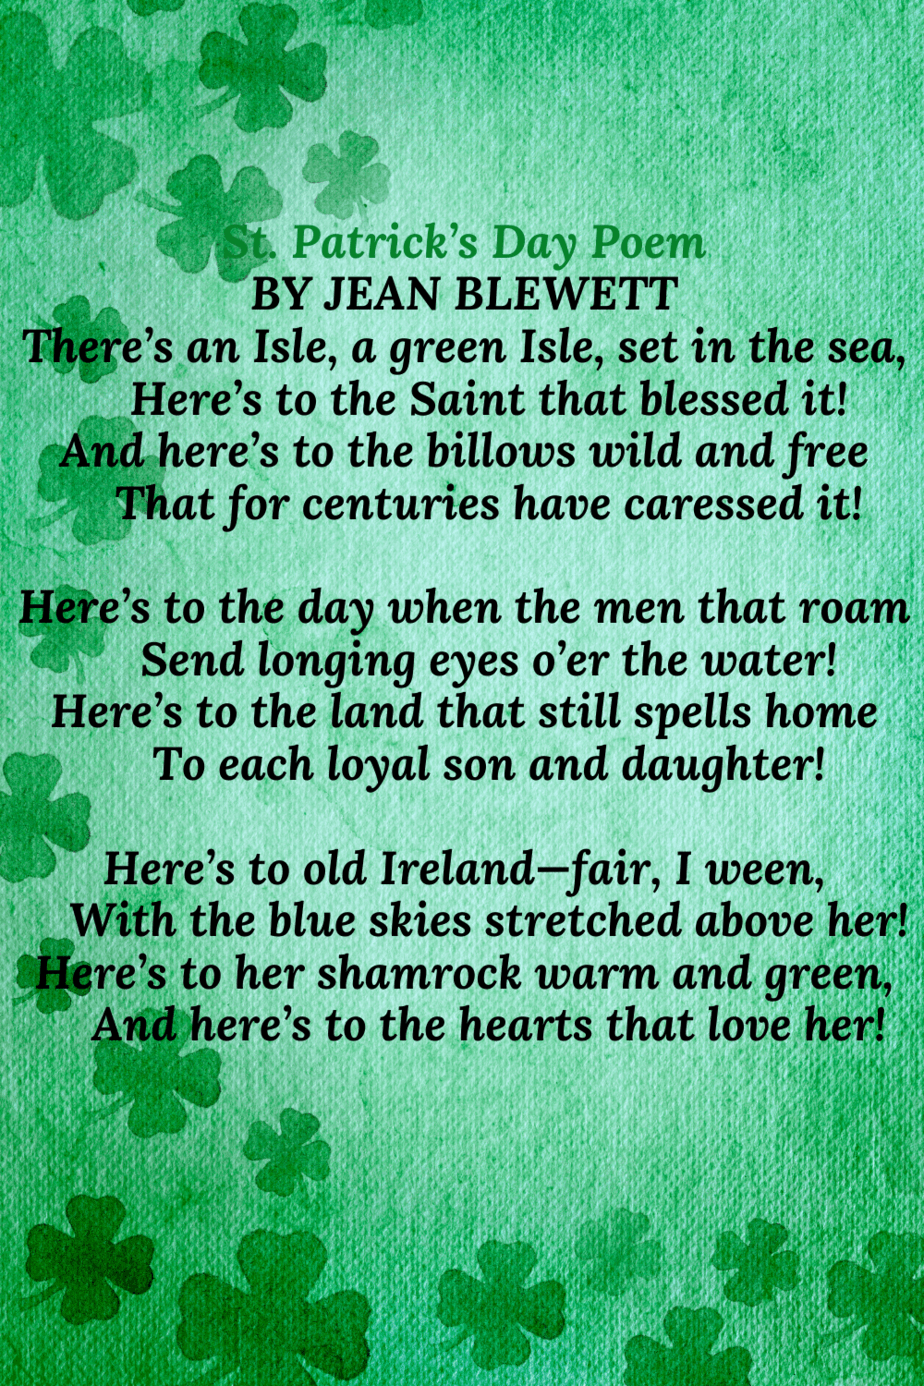 St Patricks day poem